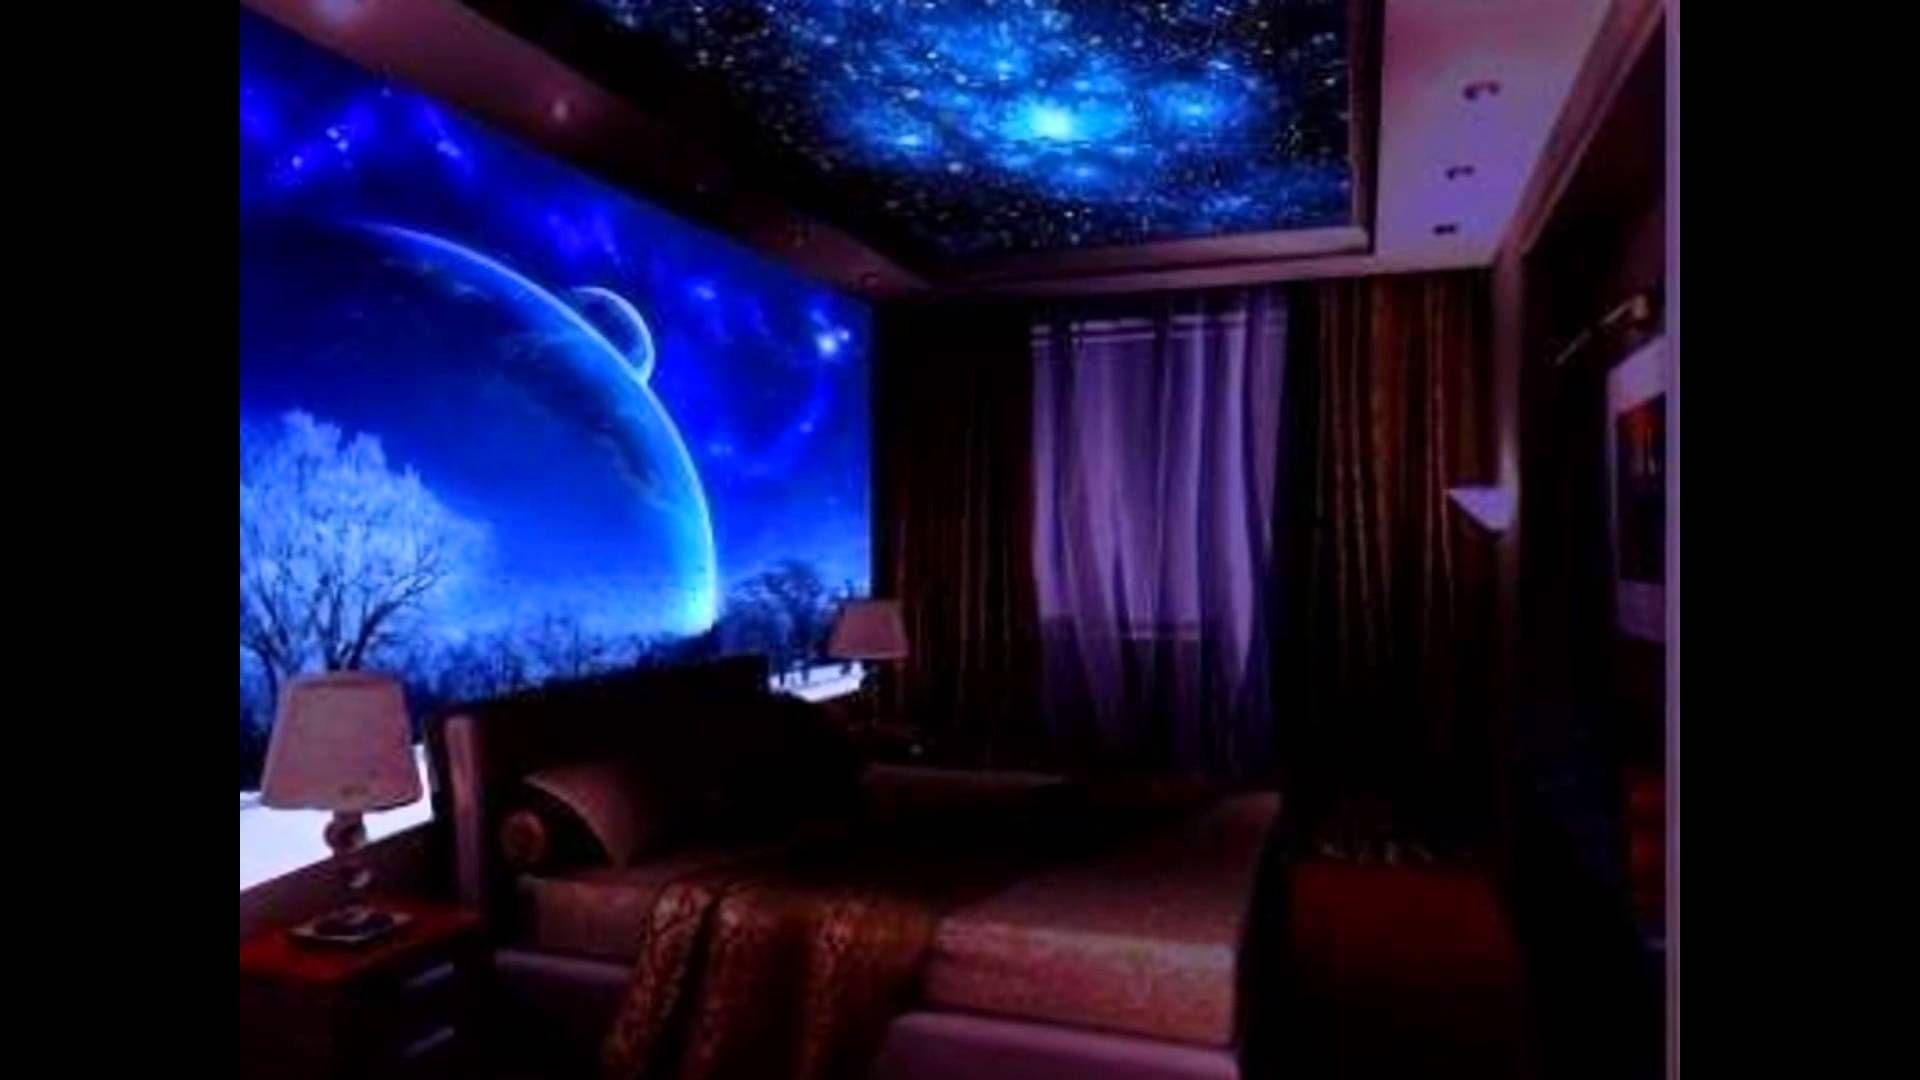 Glow In The Dark Bedroom Design Ideas Inspiration Modern Bedroom Designs 85444873 Wallpaper Designs For Walls Wallpaper For Home Wall Wallpaper House Design